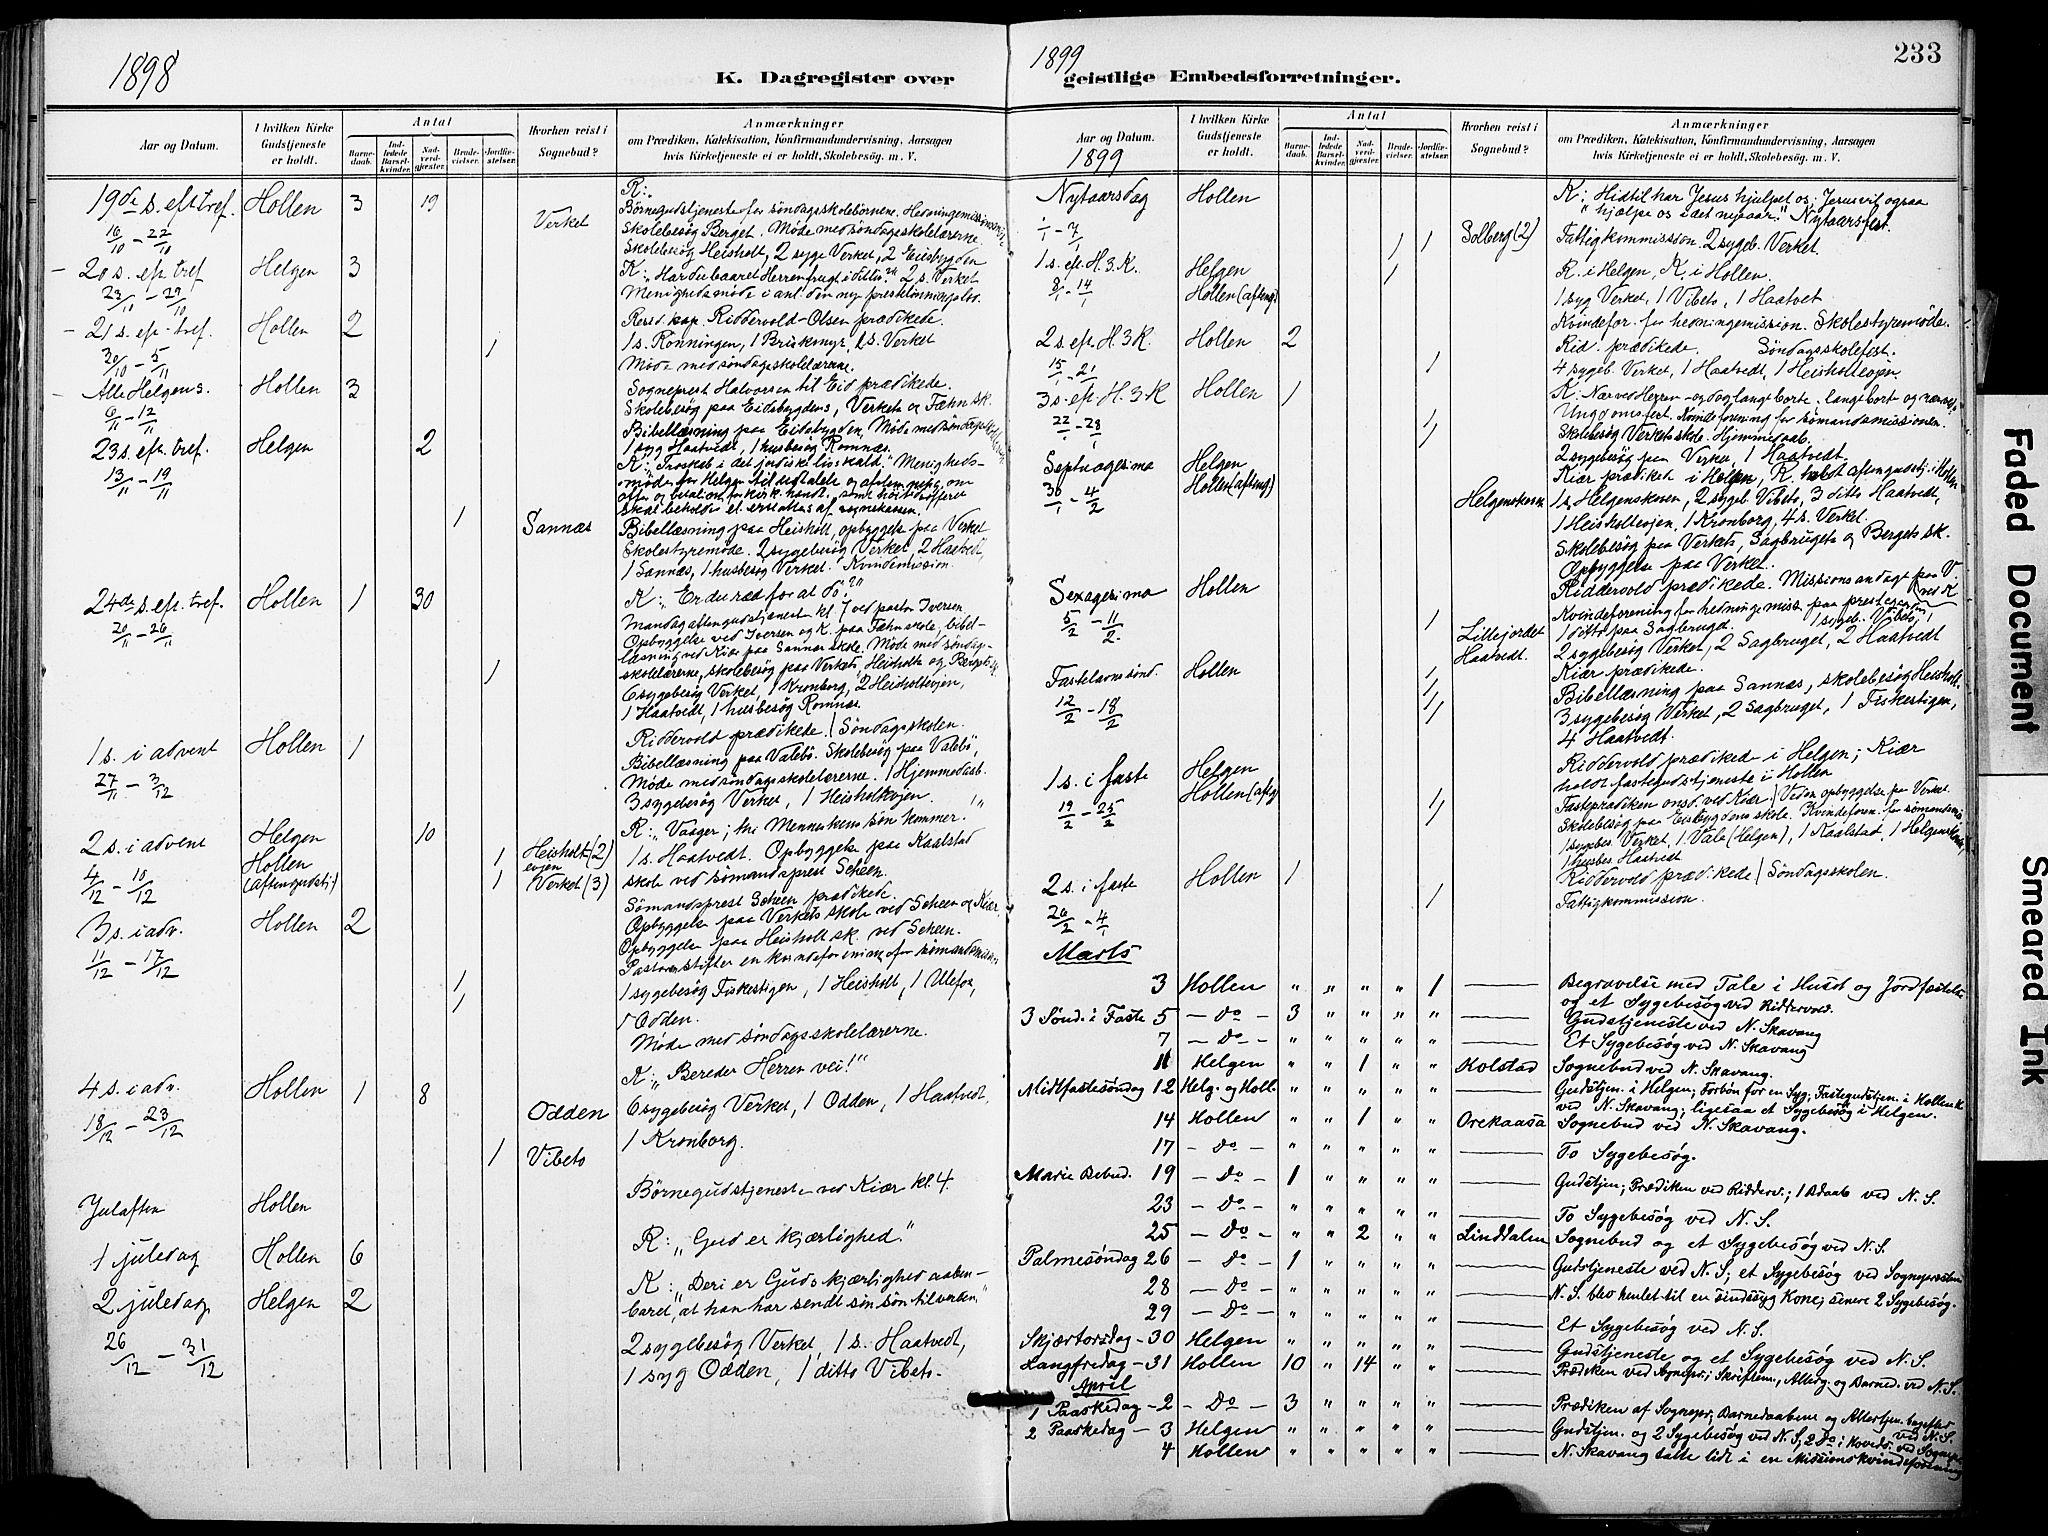 SAKO, Holla kirkebøker, F/Fa/L0010: Ministerialbok nr. 10, 1897-1907, s. 233